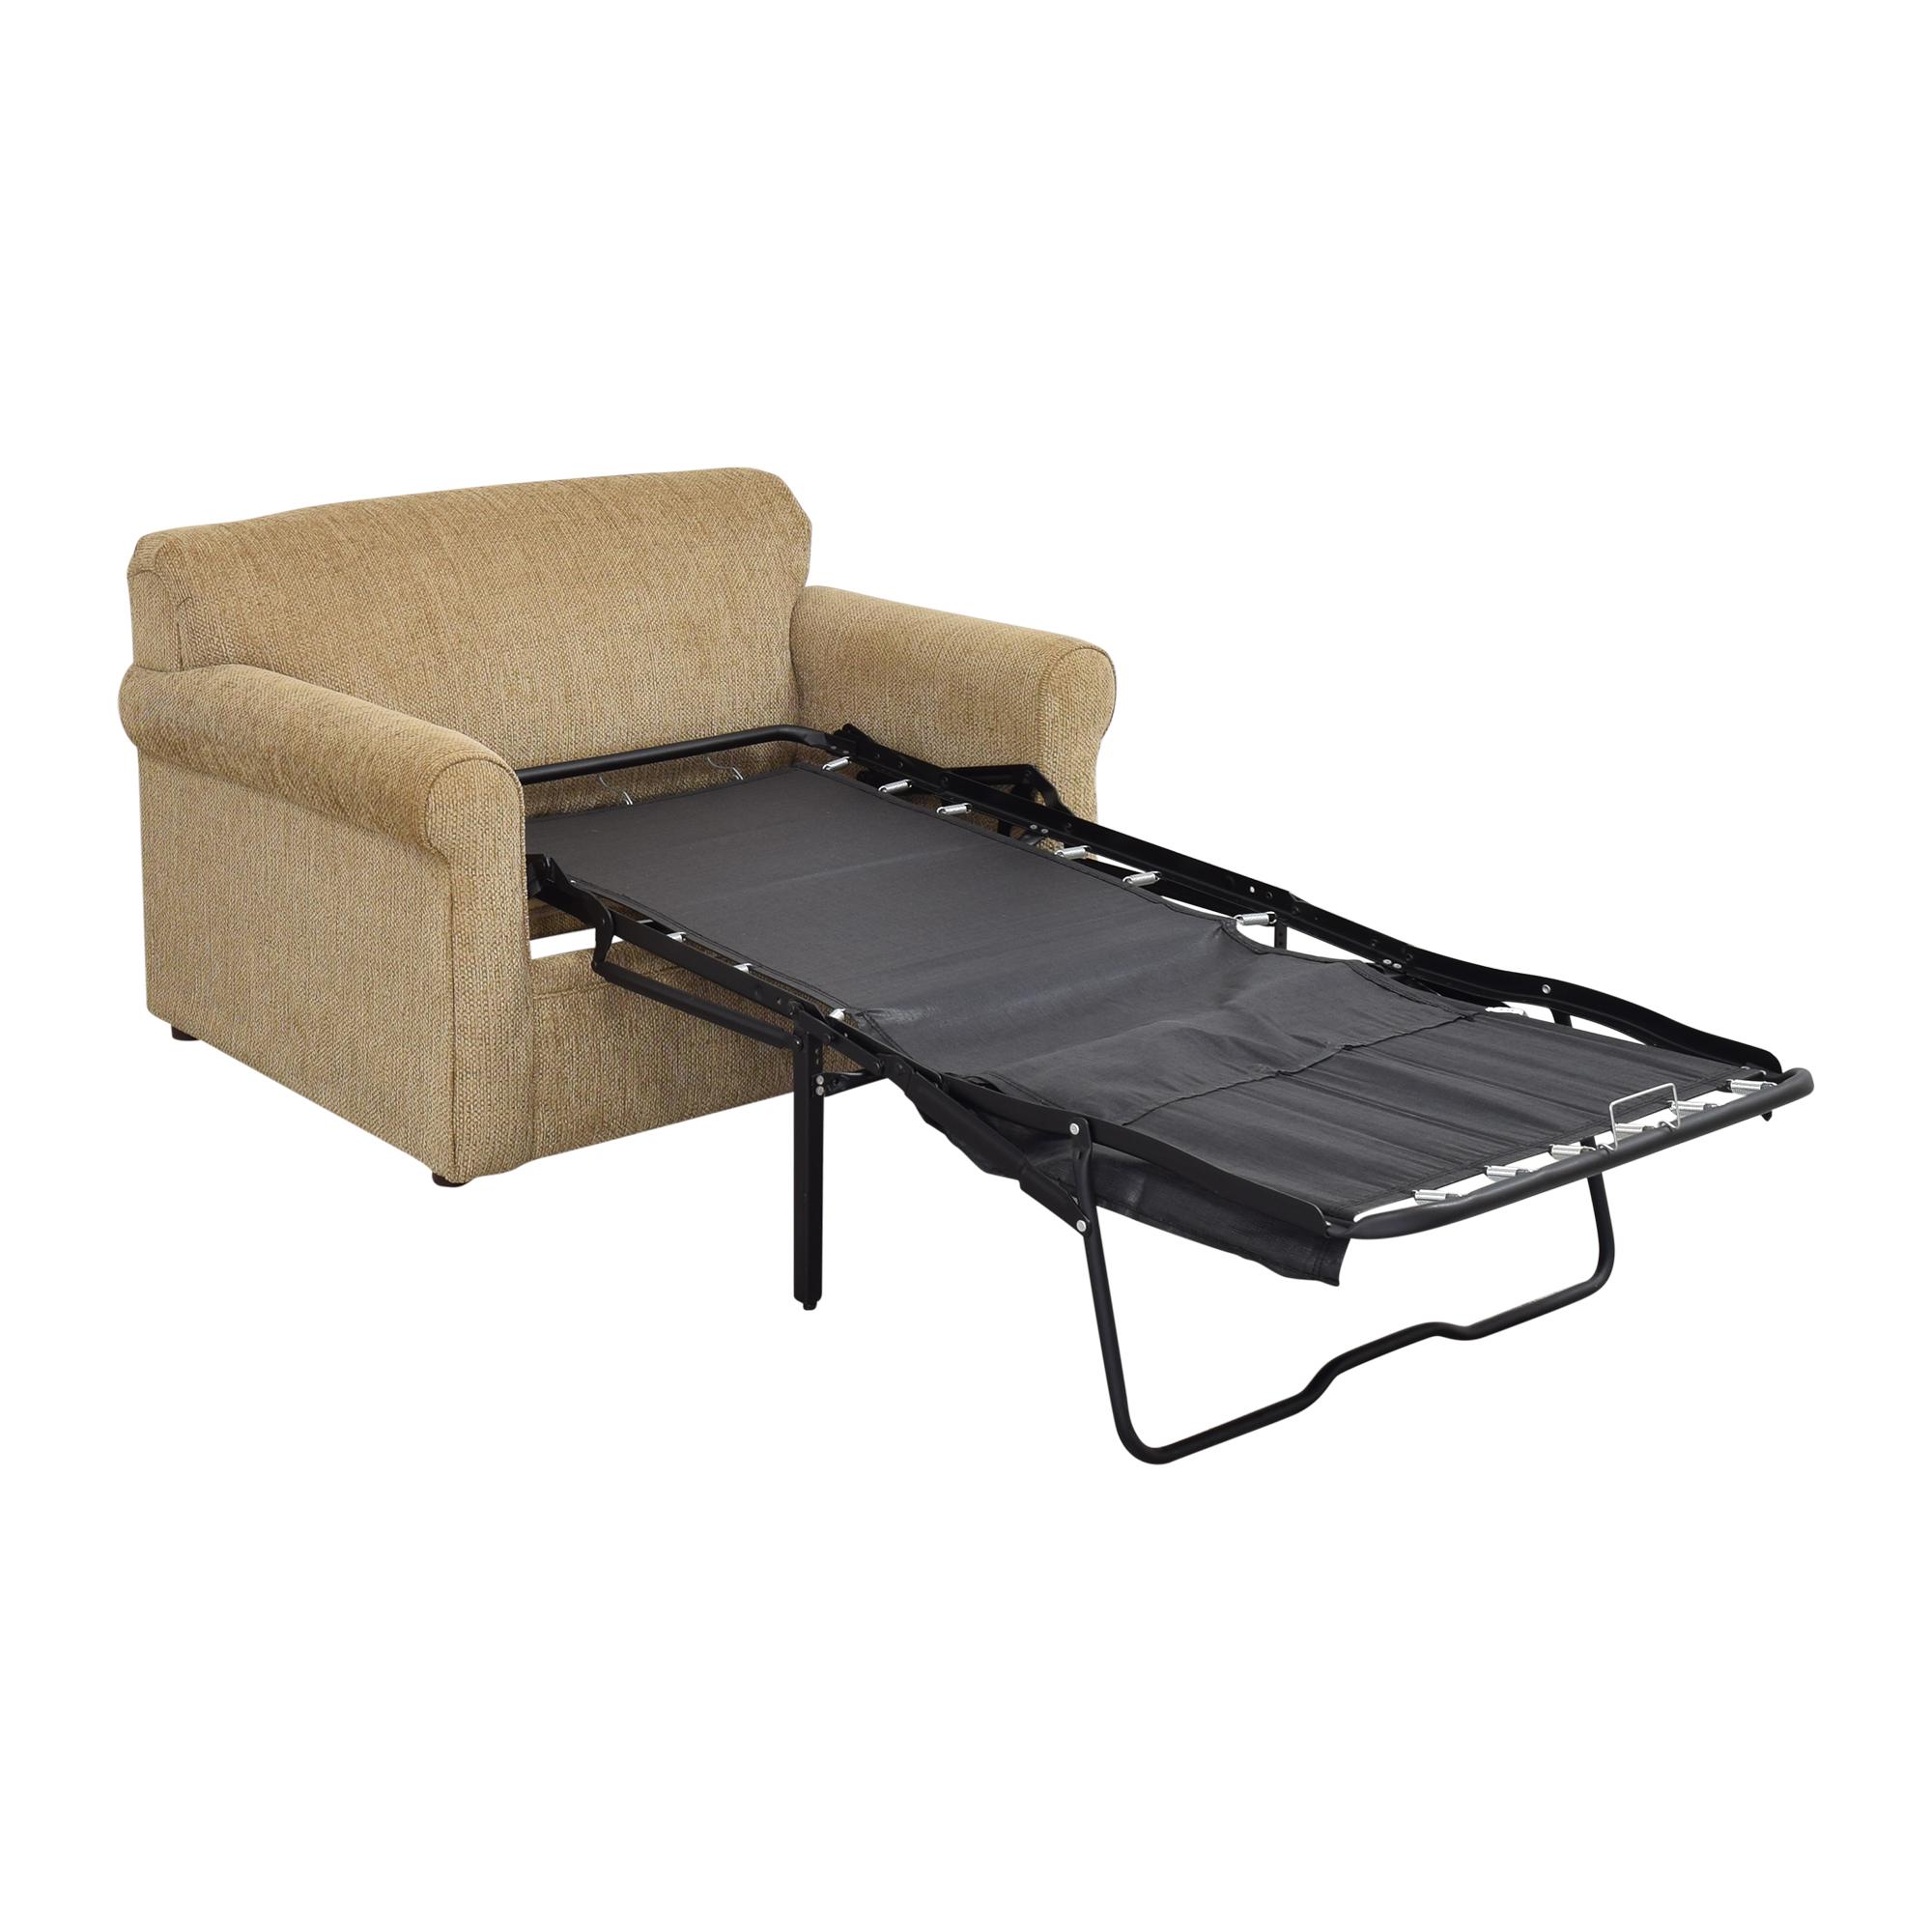 Overnight Sofa Overnight Sofa Sleeper Chair ma